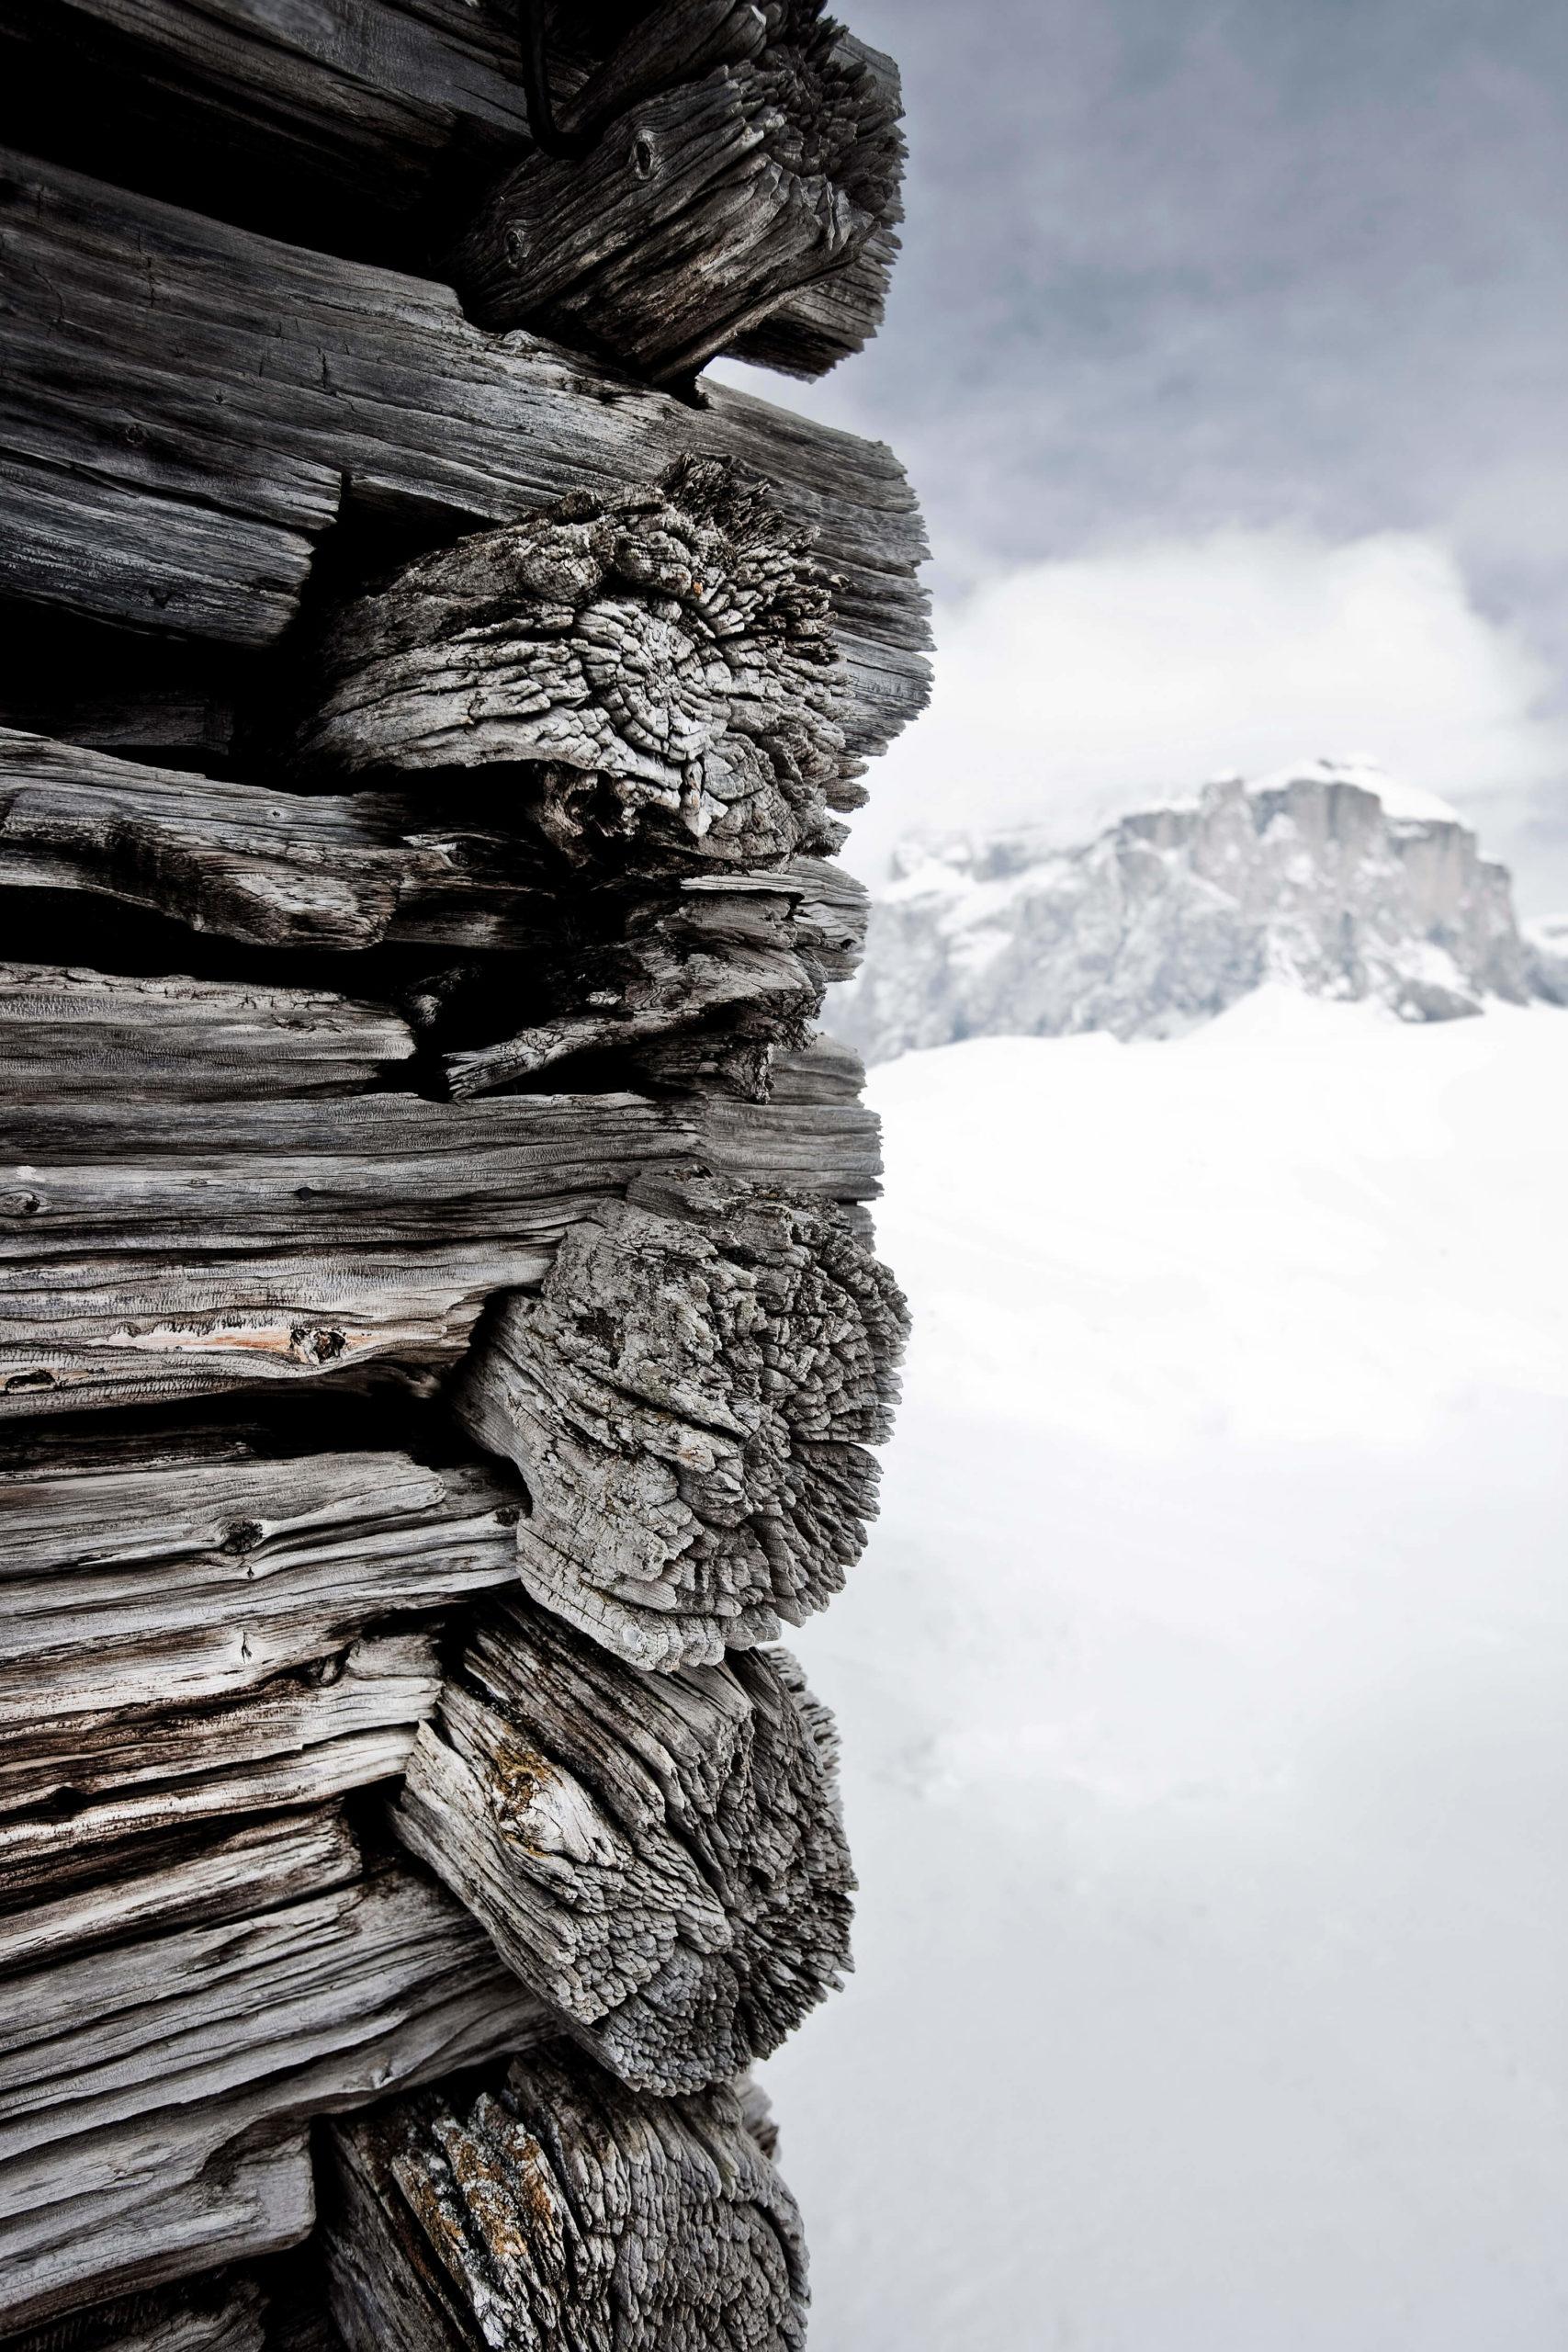 Snowbound shepherd huts, Dolomites